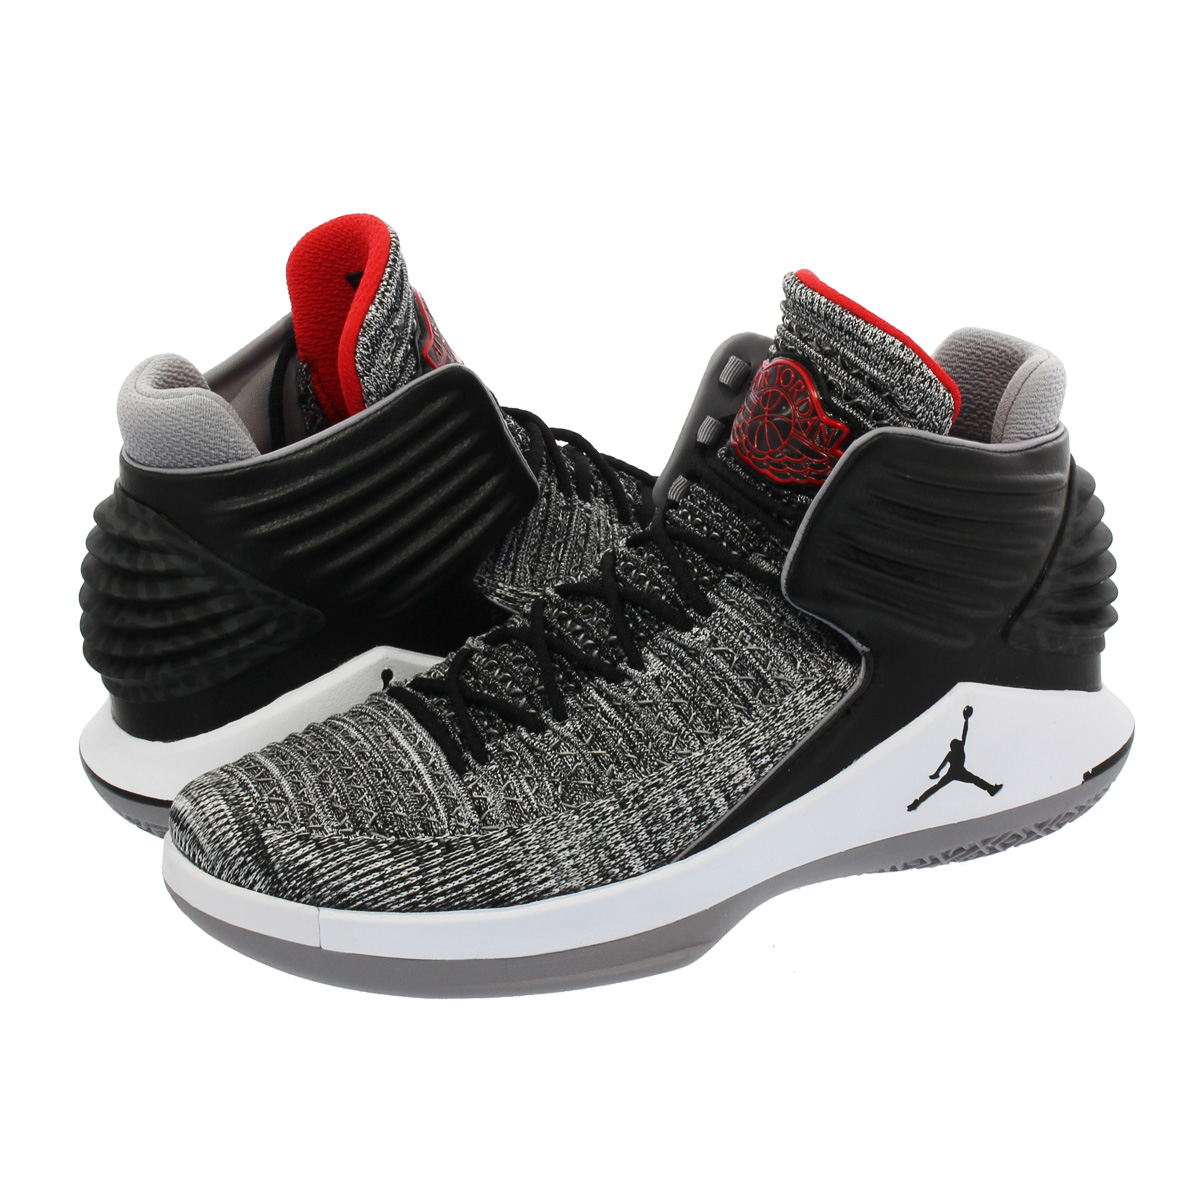 3b70b892fab1 NIKE AIR JORDAN XXXII Nike Air Jordan 32 BLACK UNIVERSITY RED WHITE CEMENT  GREY